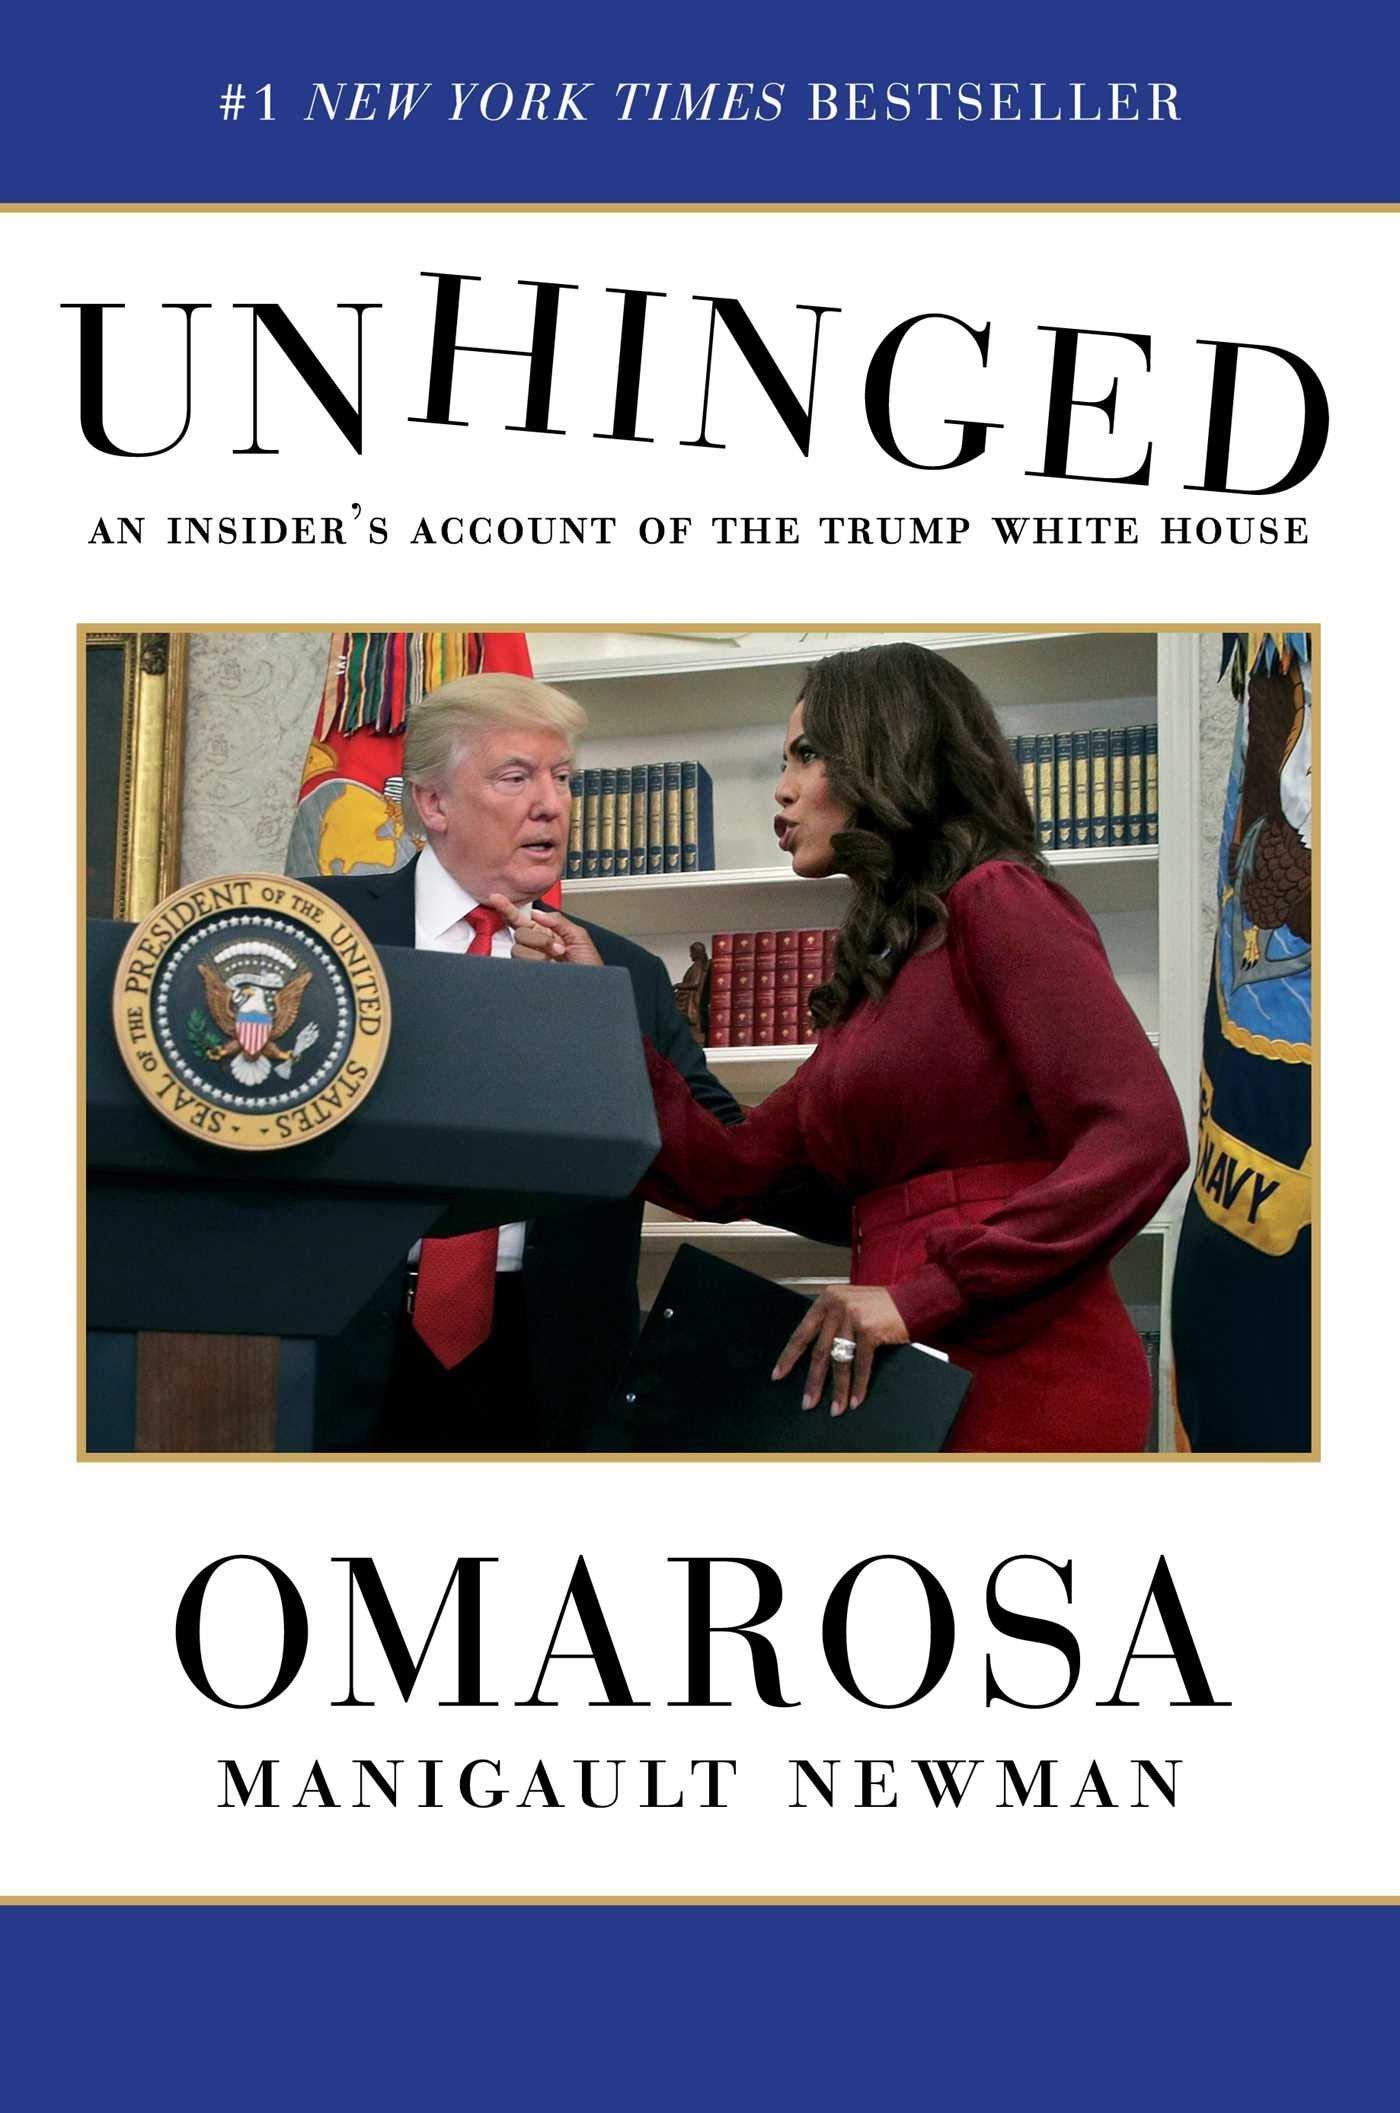 Omarosa Trumps Donald Trump in New York NDA Arbitration Case